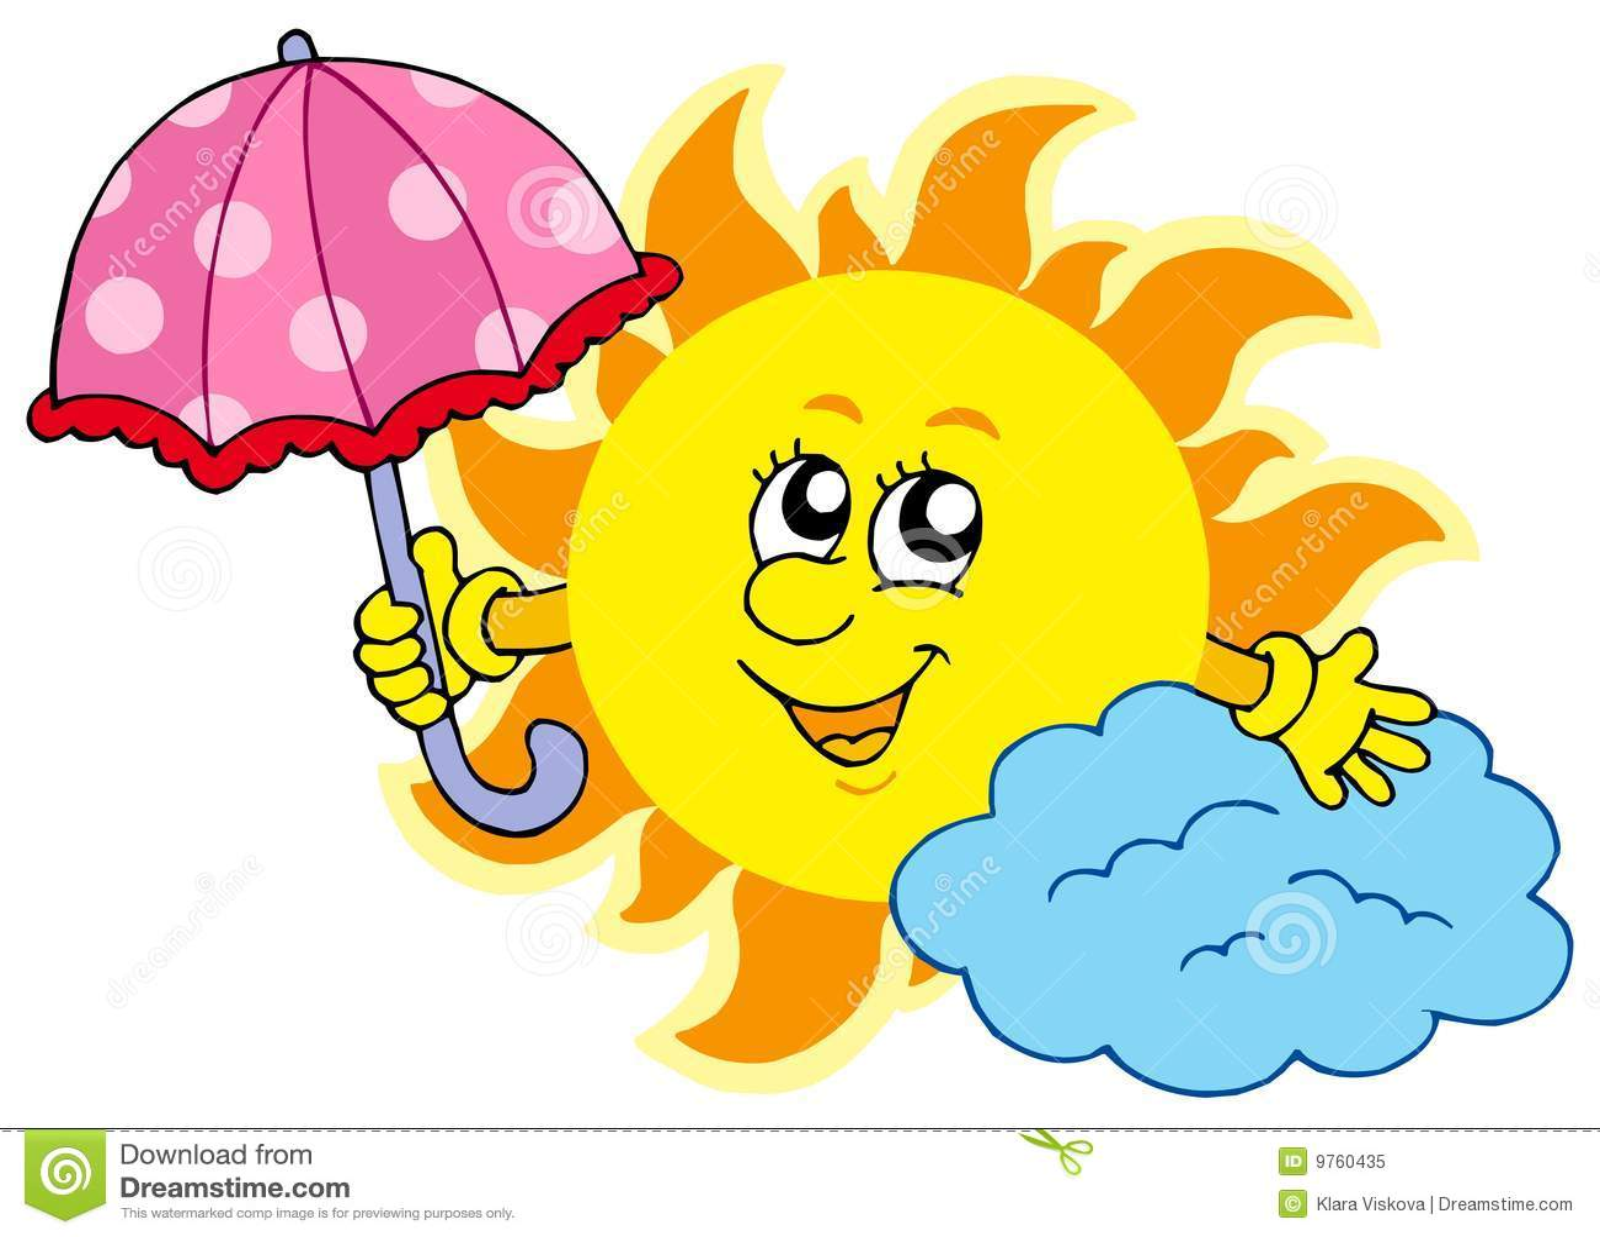 Cute Cartoon Sun With Umbrella Stock Vector - Illustration ...